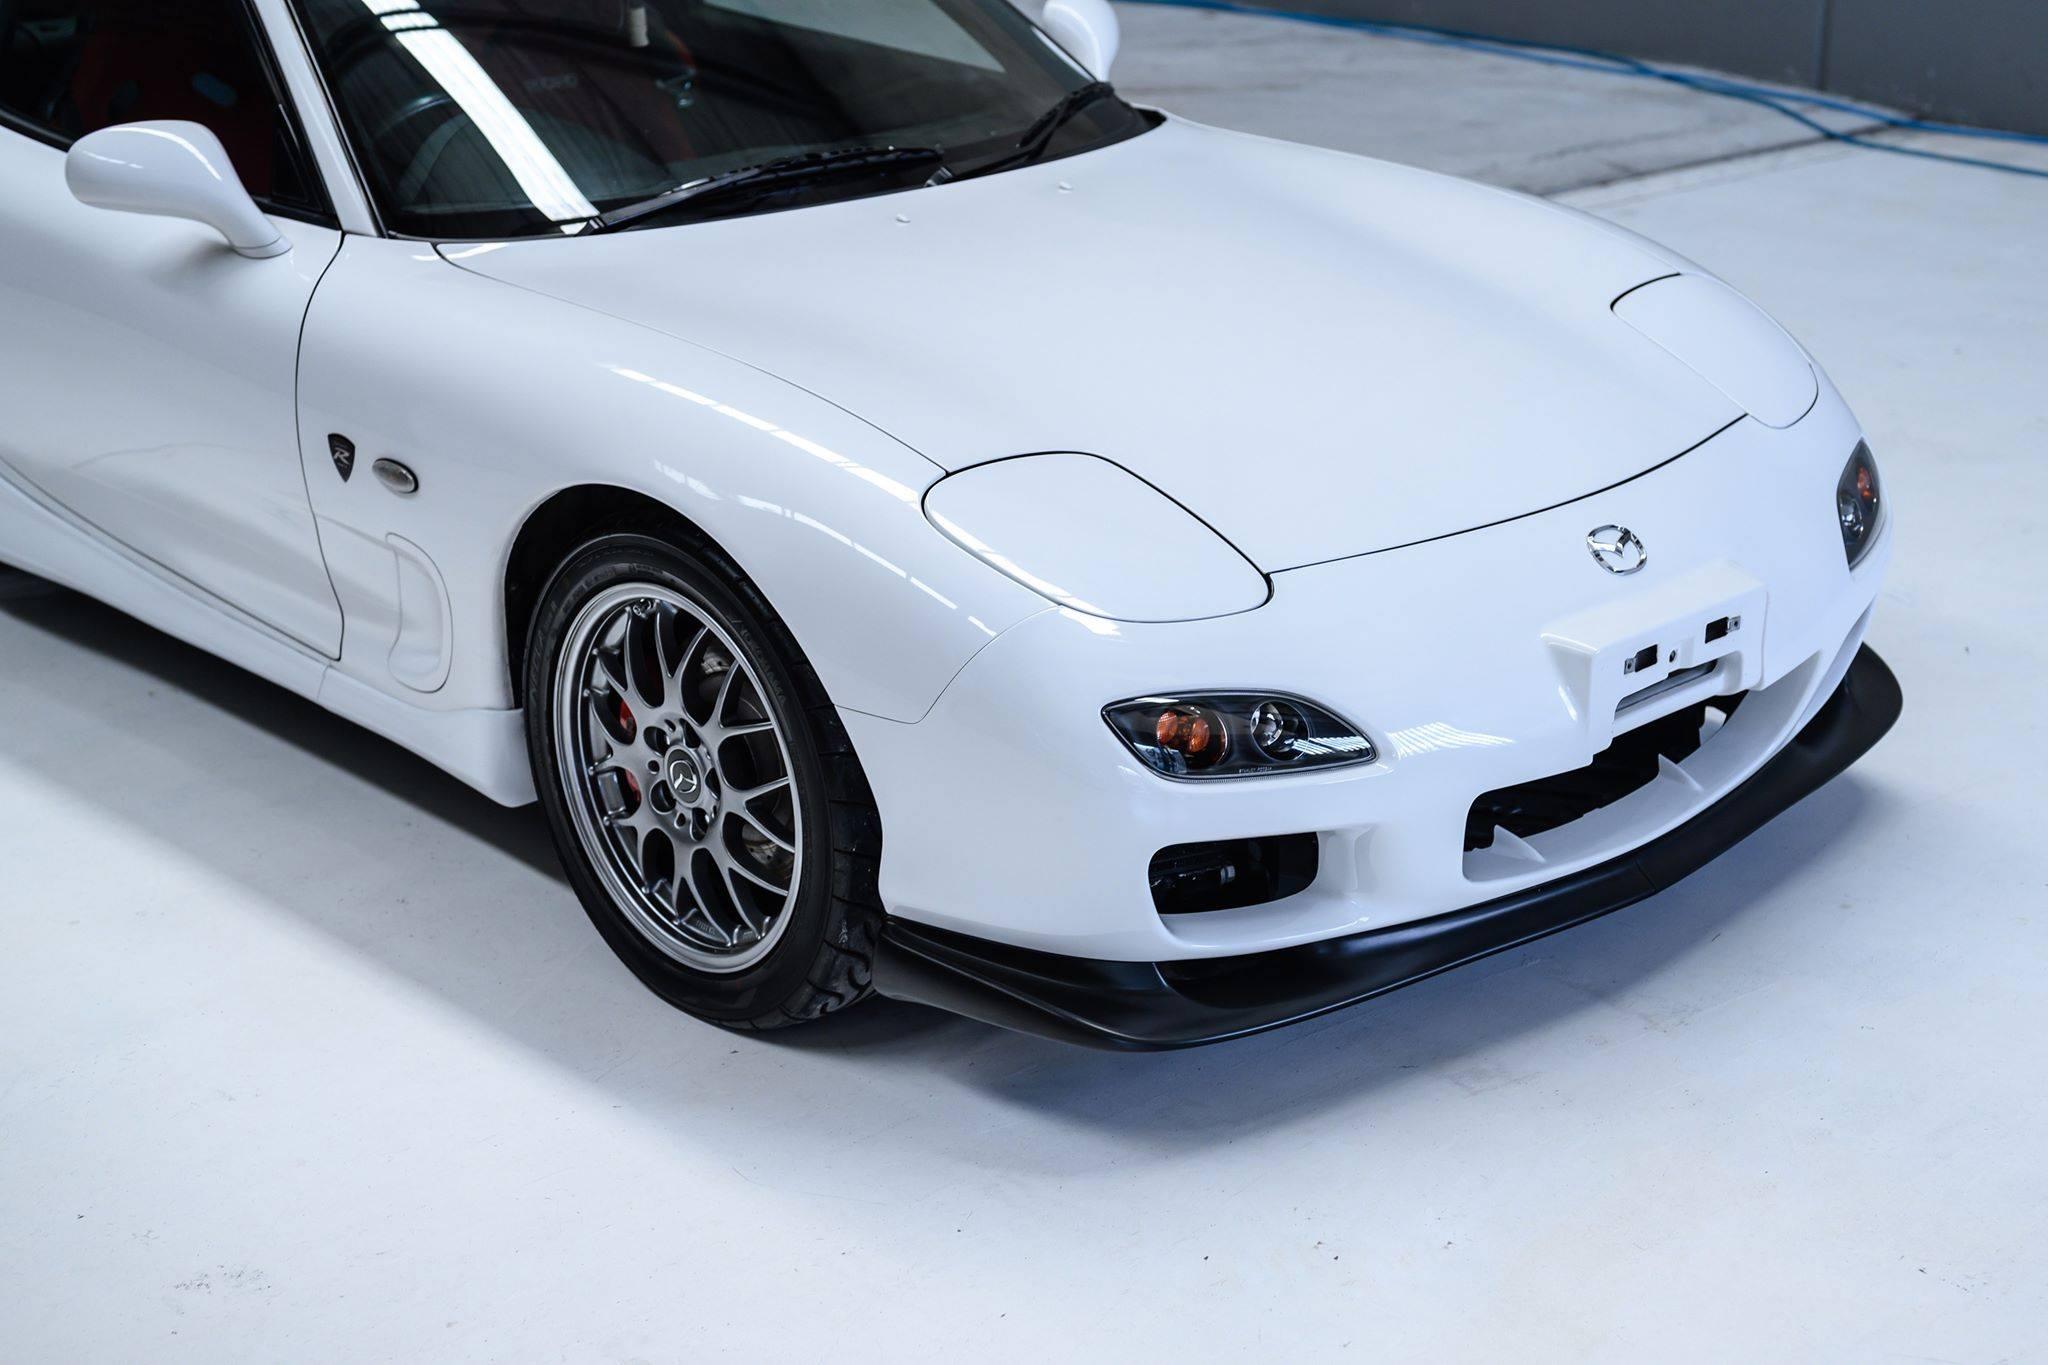 2002_Mazda_RX-7_Spirit-R_Type-A_sale_0008